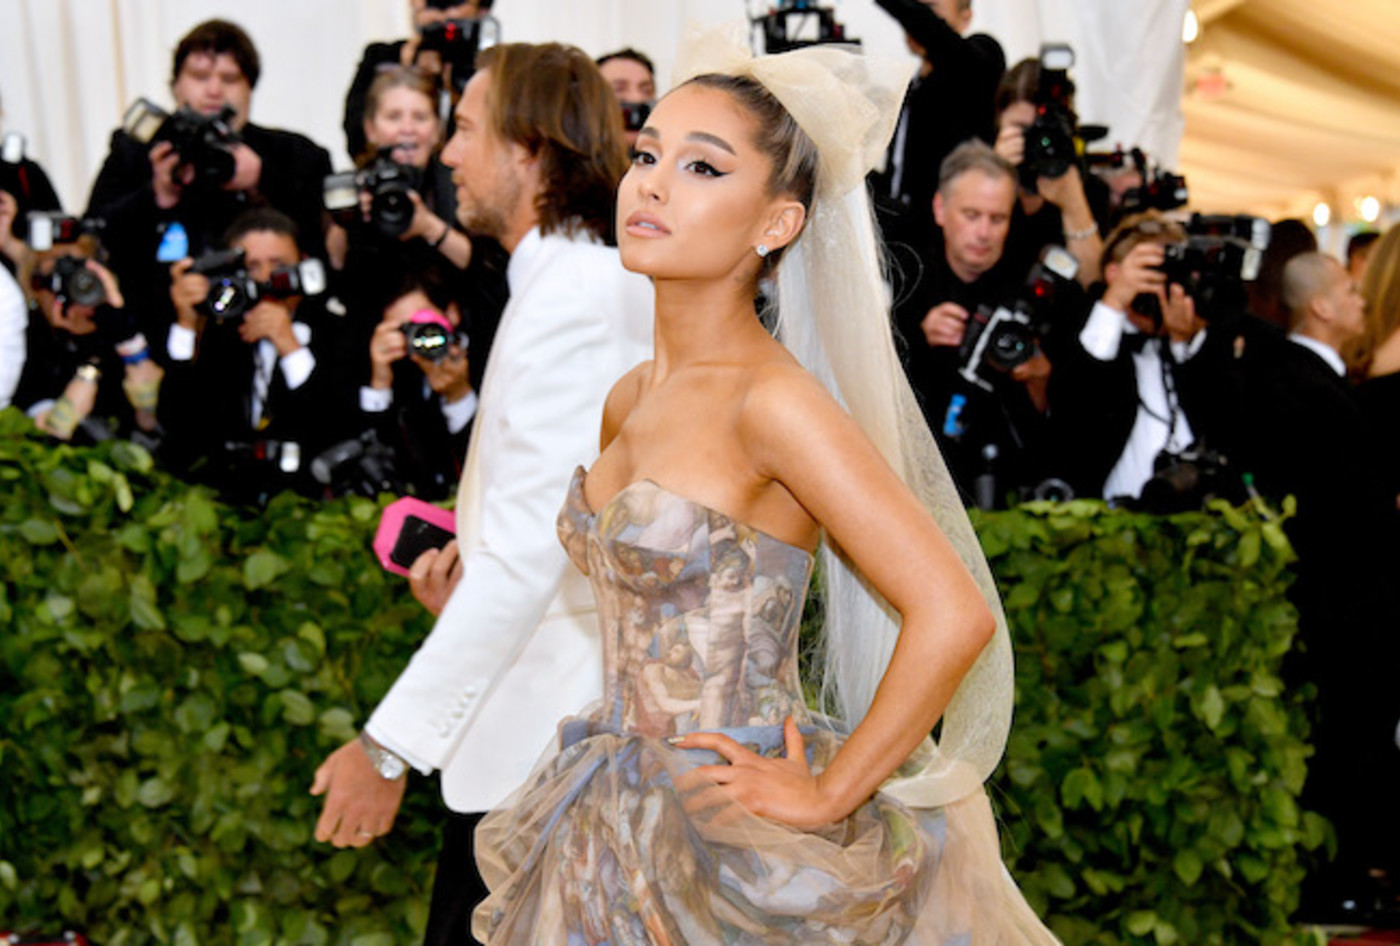 Ariana Grande at the Met Ball